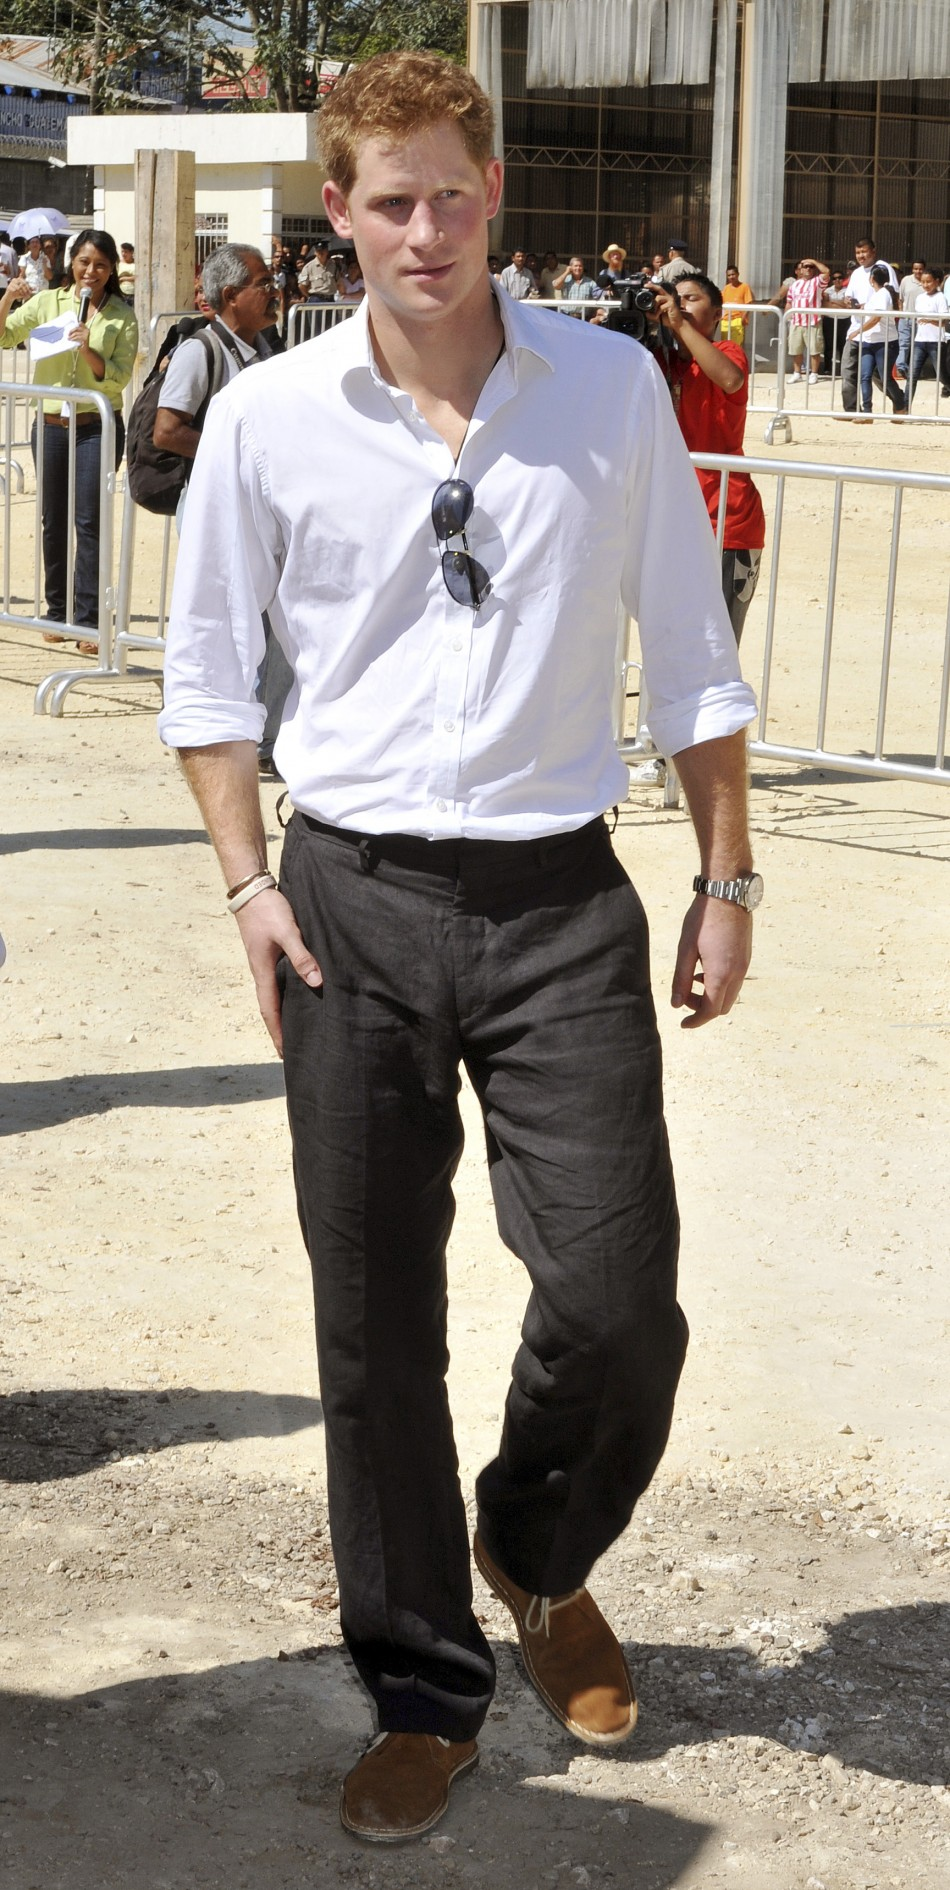 Fashion Focus: Prince Harry's Caribbean Style